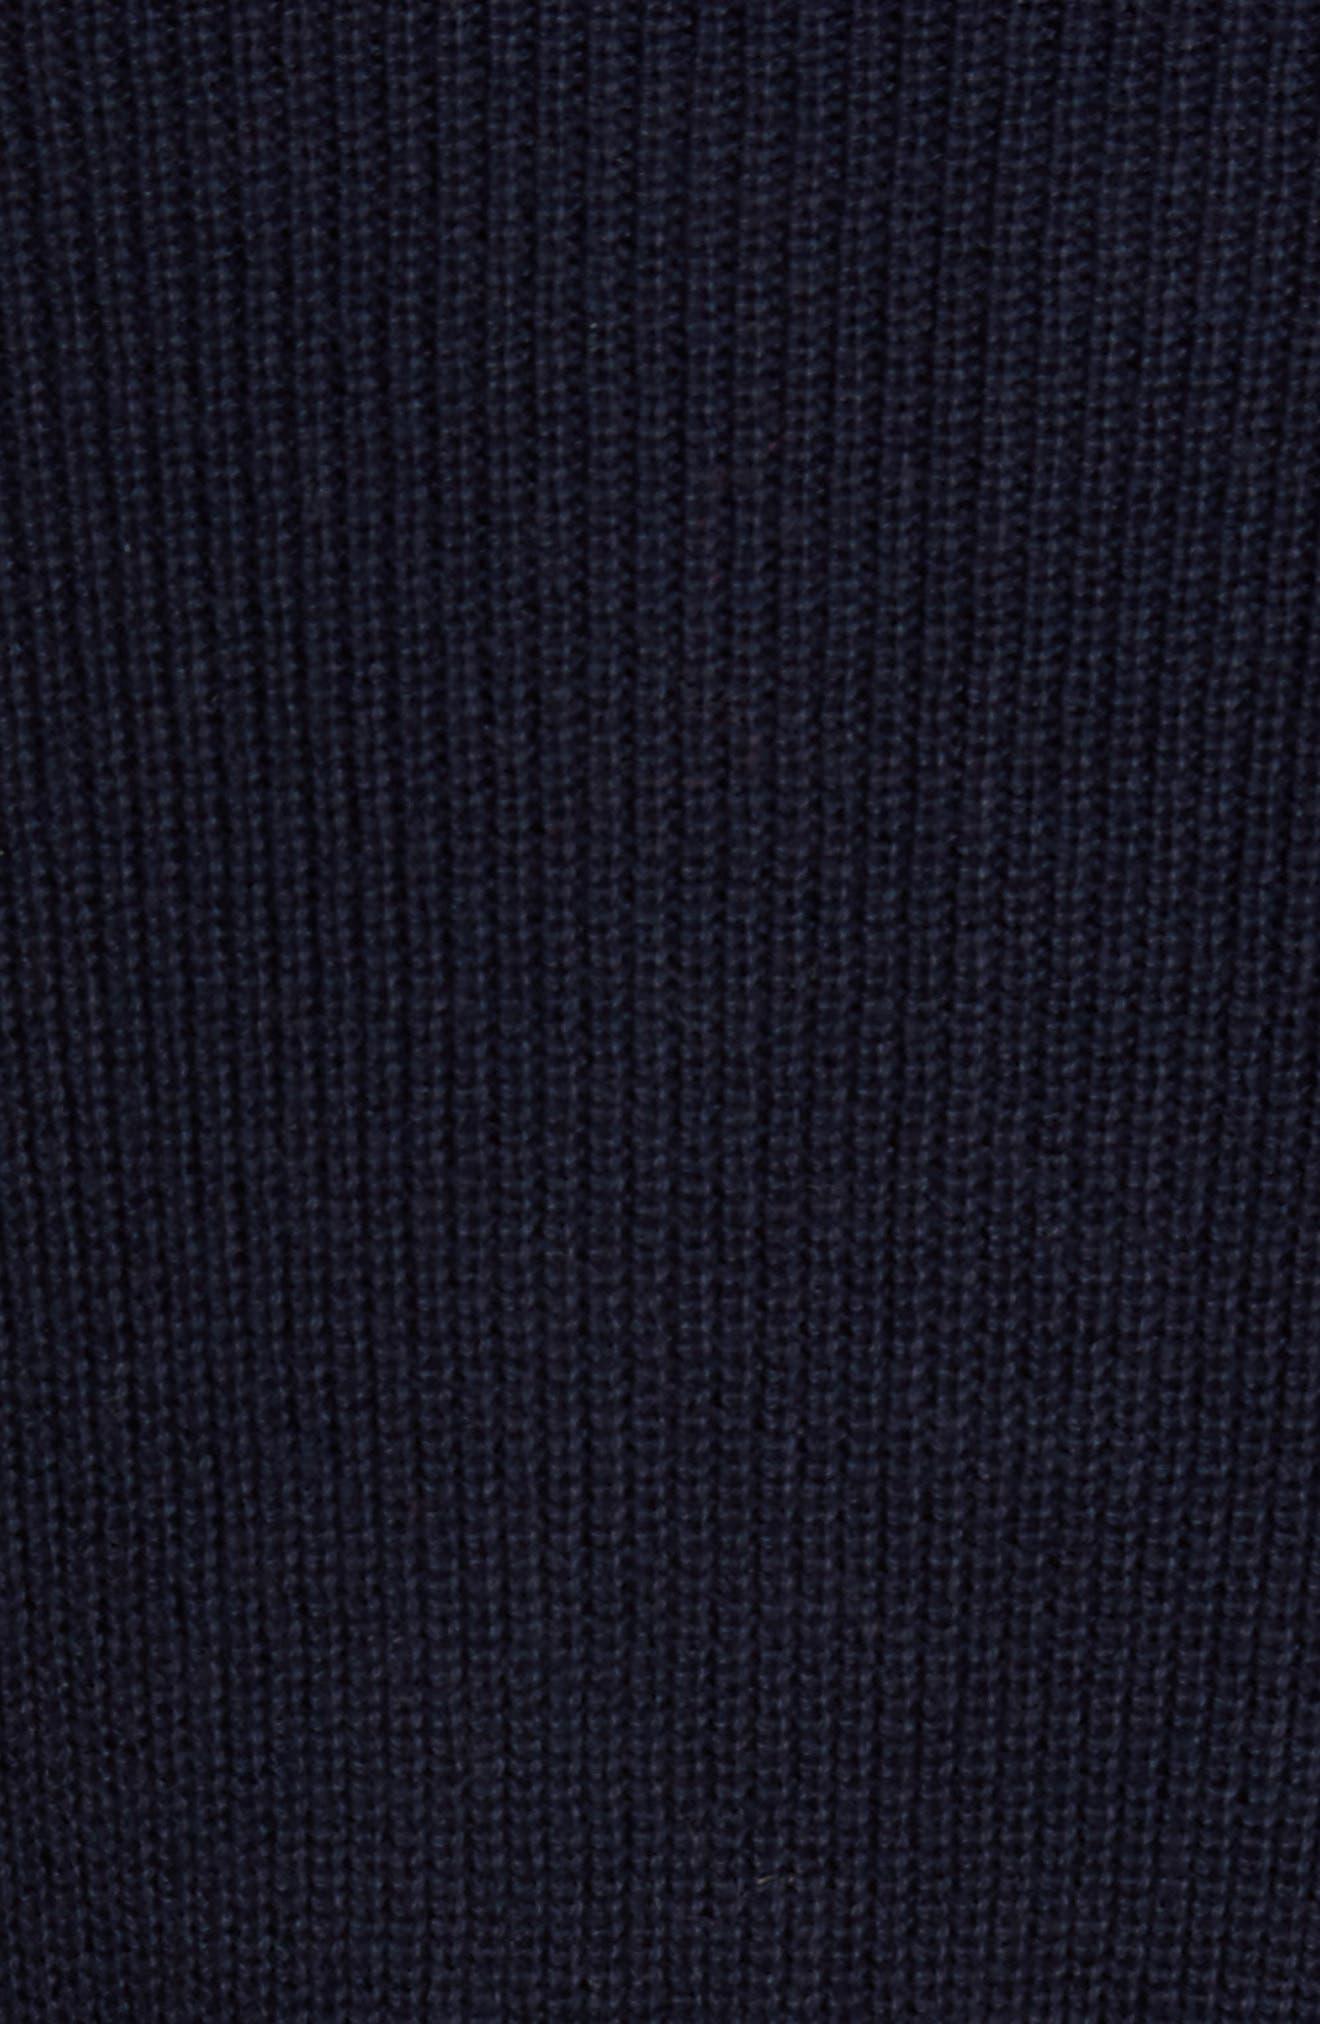 Cotton & Cashmere Henley Sweater,                             Alternate thumbnail 14, color,